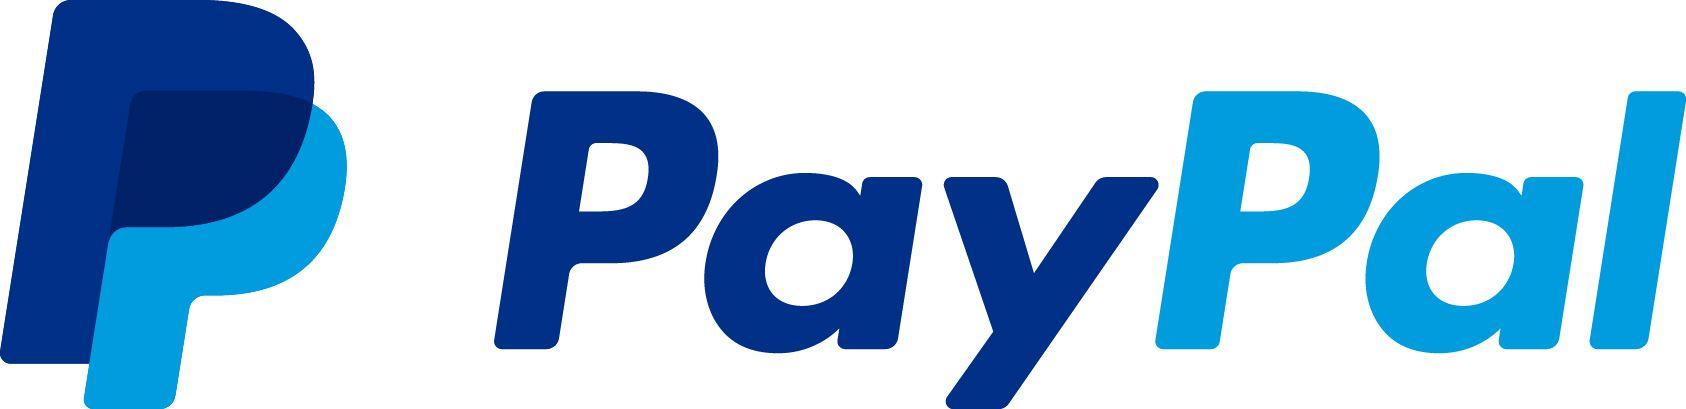 Fotografia PayPal